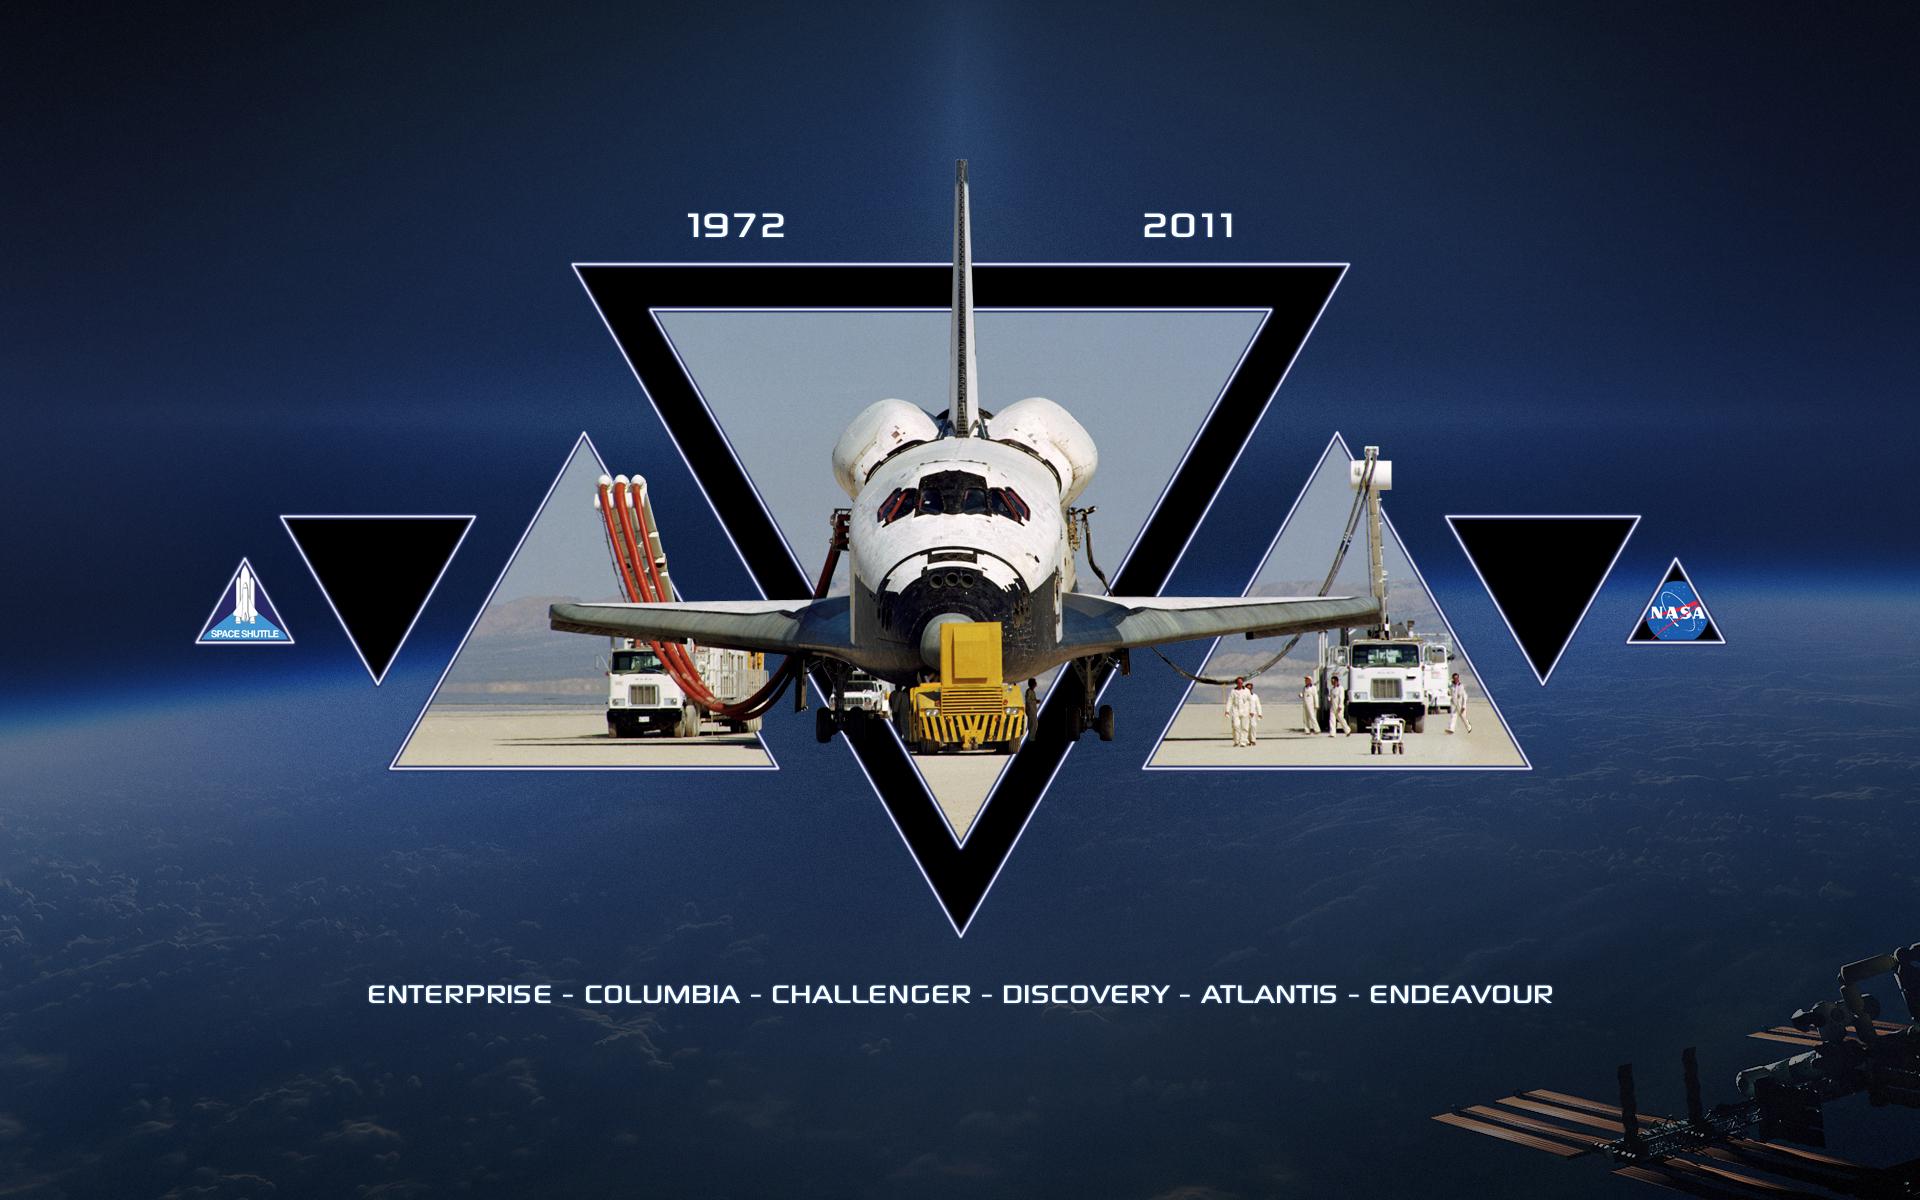 El Espacio Shuttle Program Nasa Foto 36958174 Fanpop